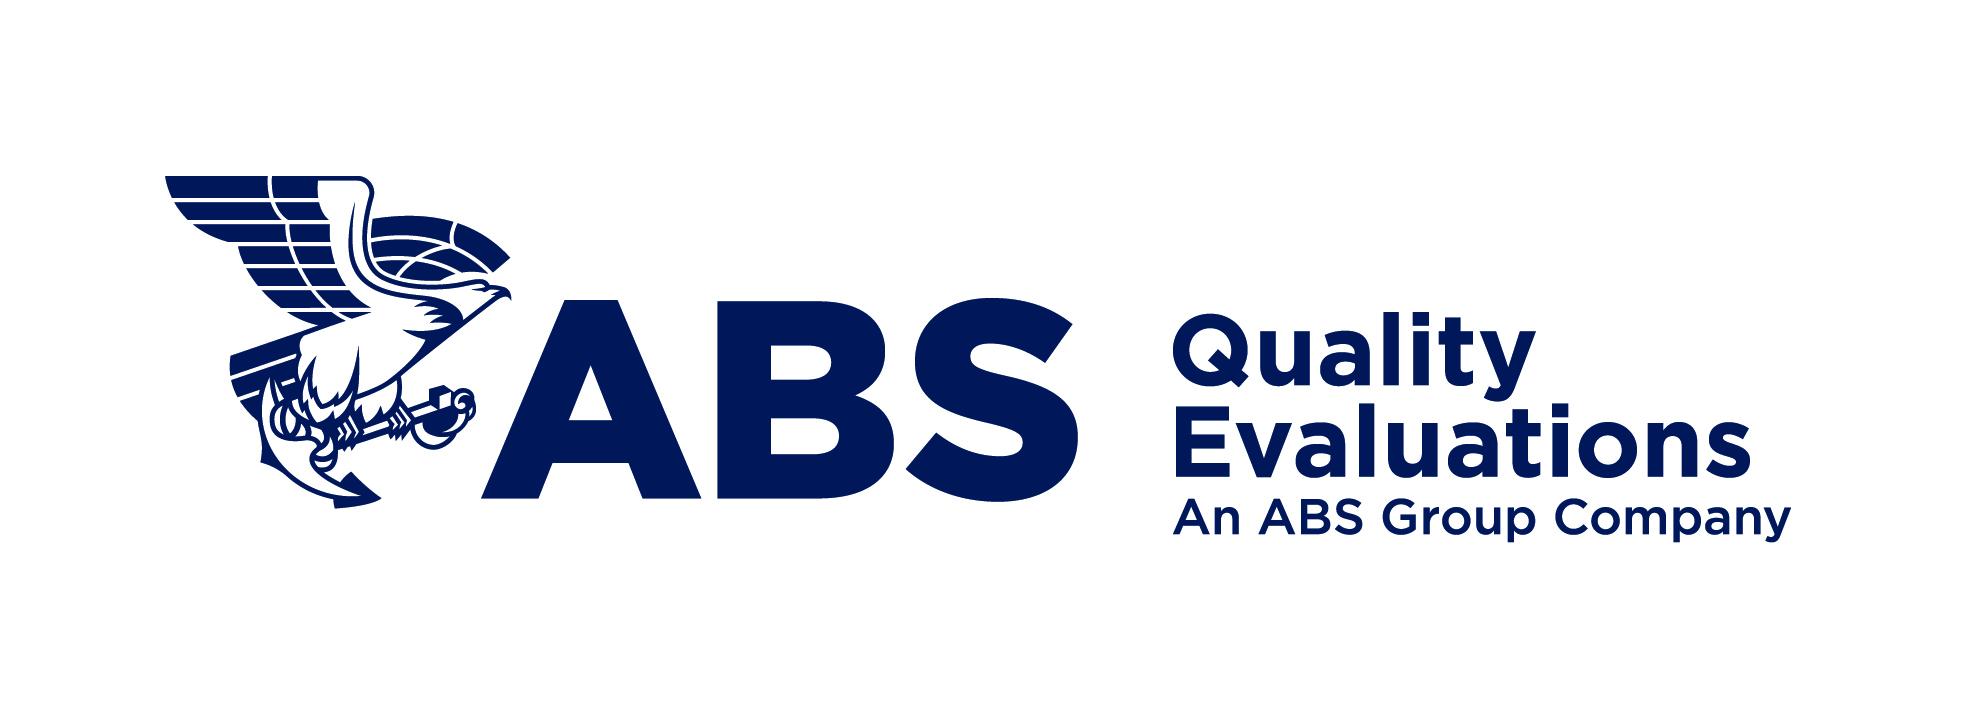 abs-qe-logo-rgb540